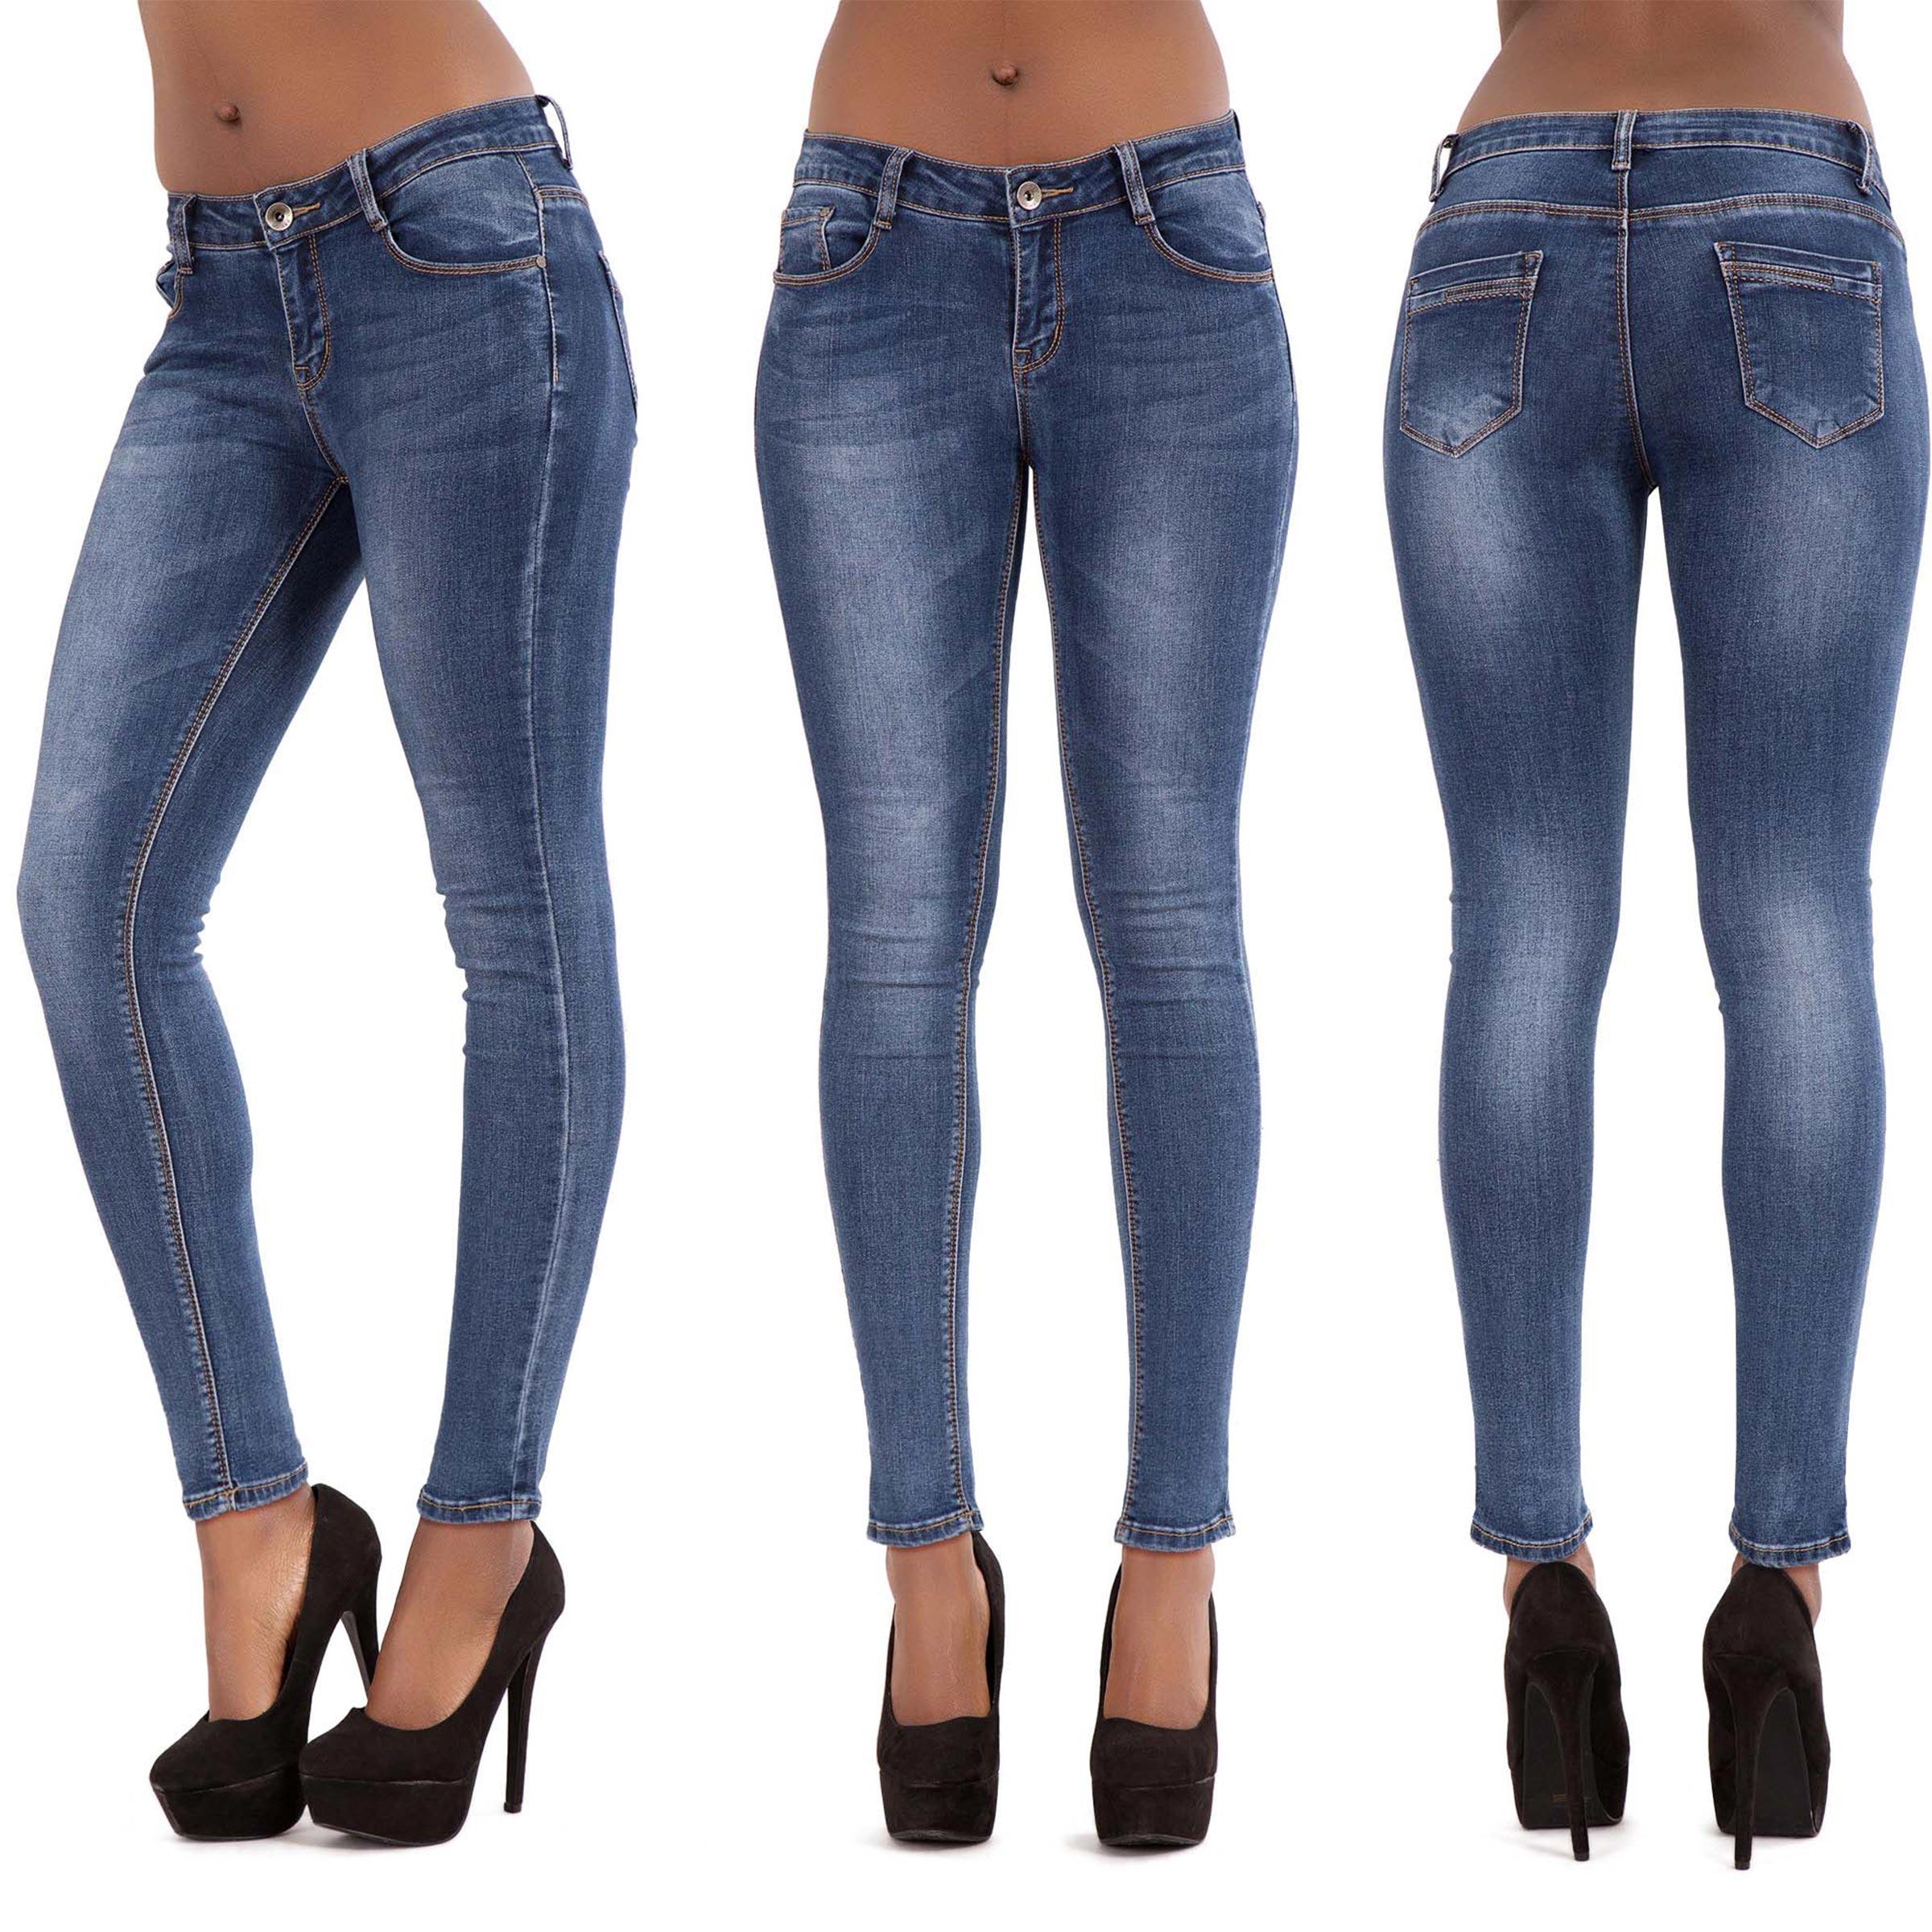 Womens-Ripped-Knee-Skinny-Jeans-Camo-Slim-Fit-Ladies-Denim-Size-6-8-10-12-14